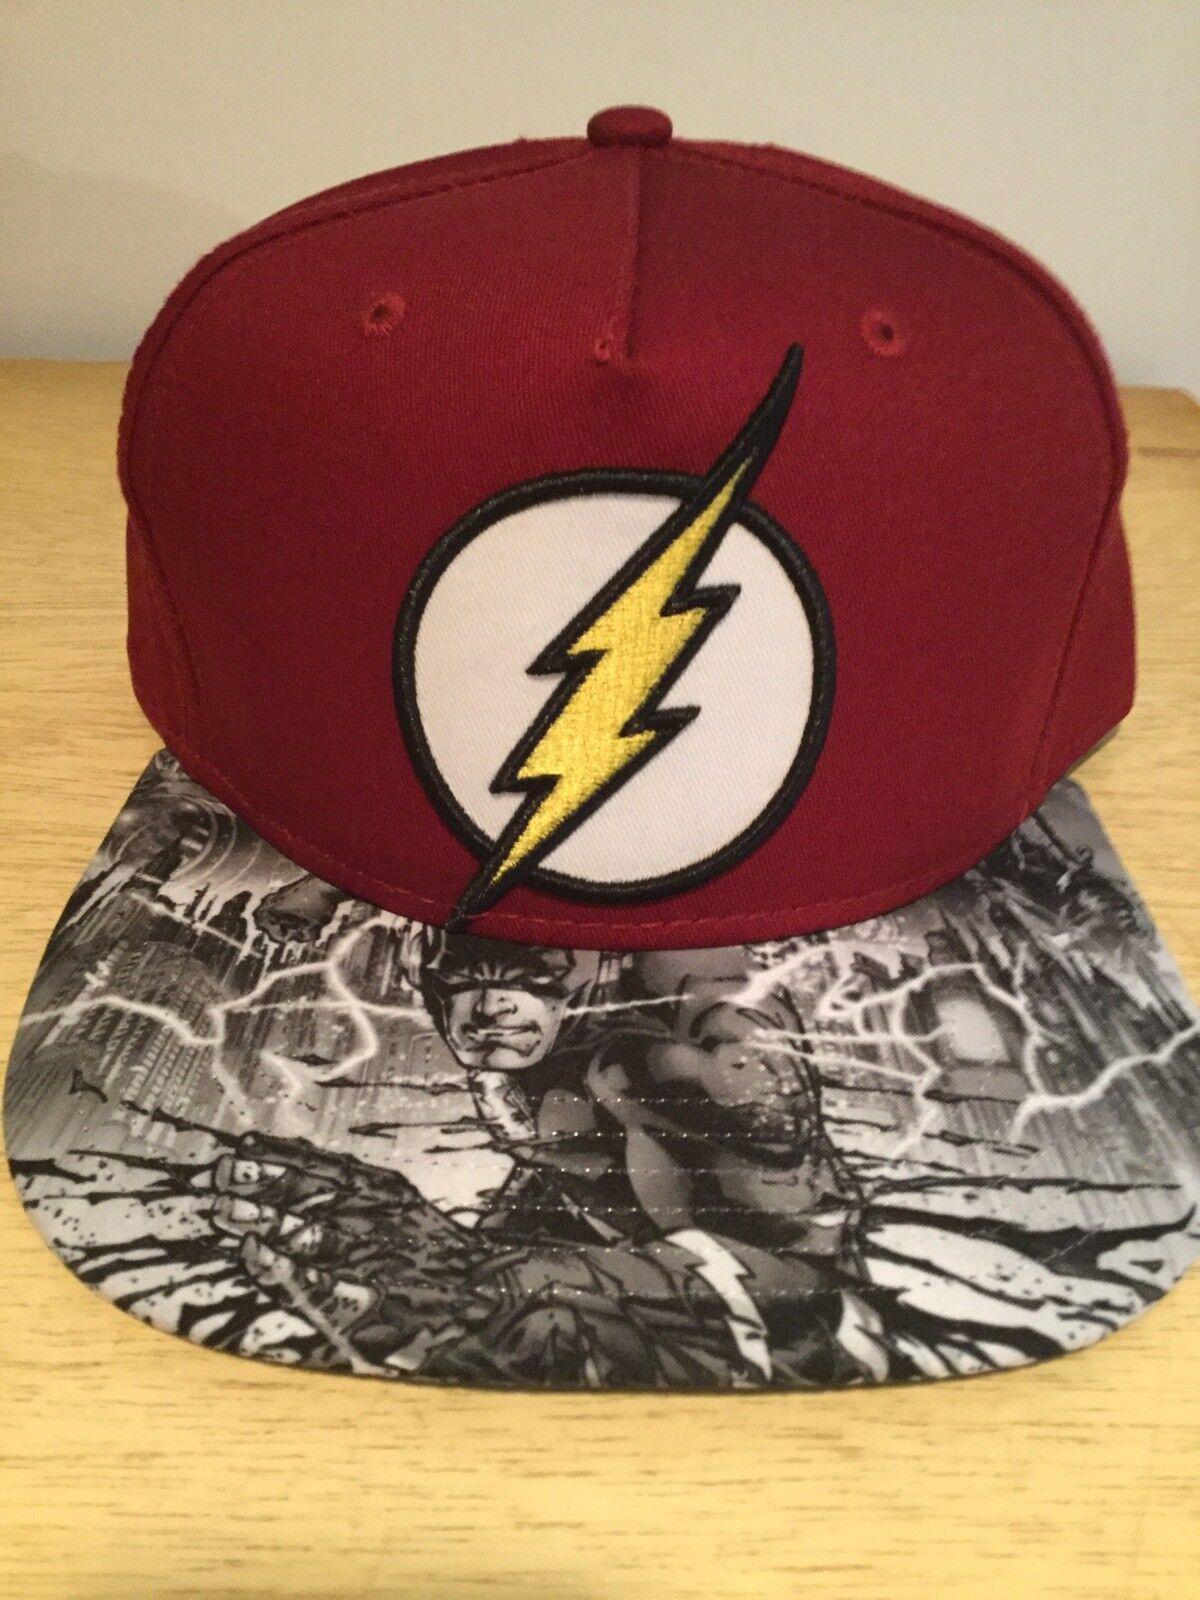 9903a1065e375 amazon d.c. comics one the flash comic book snapback hat. nwt. one comics  size